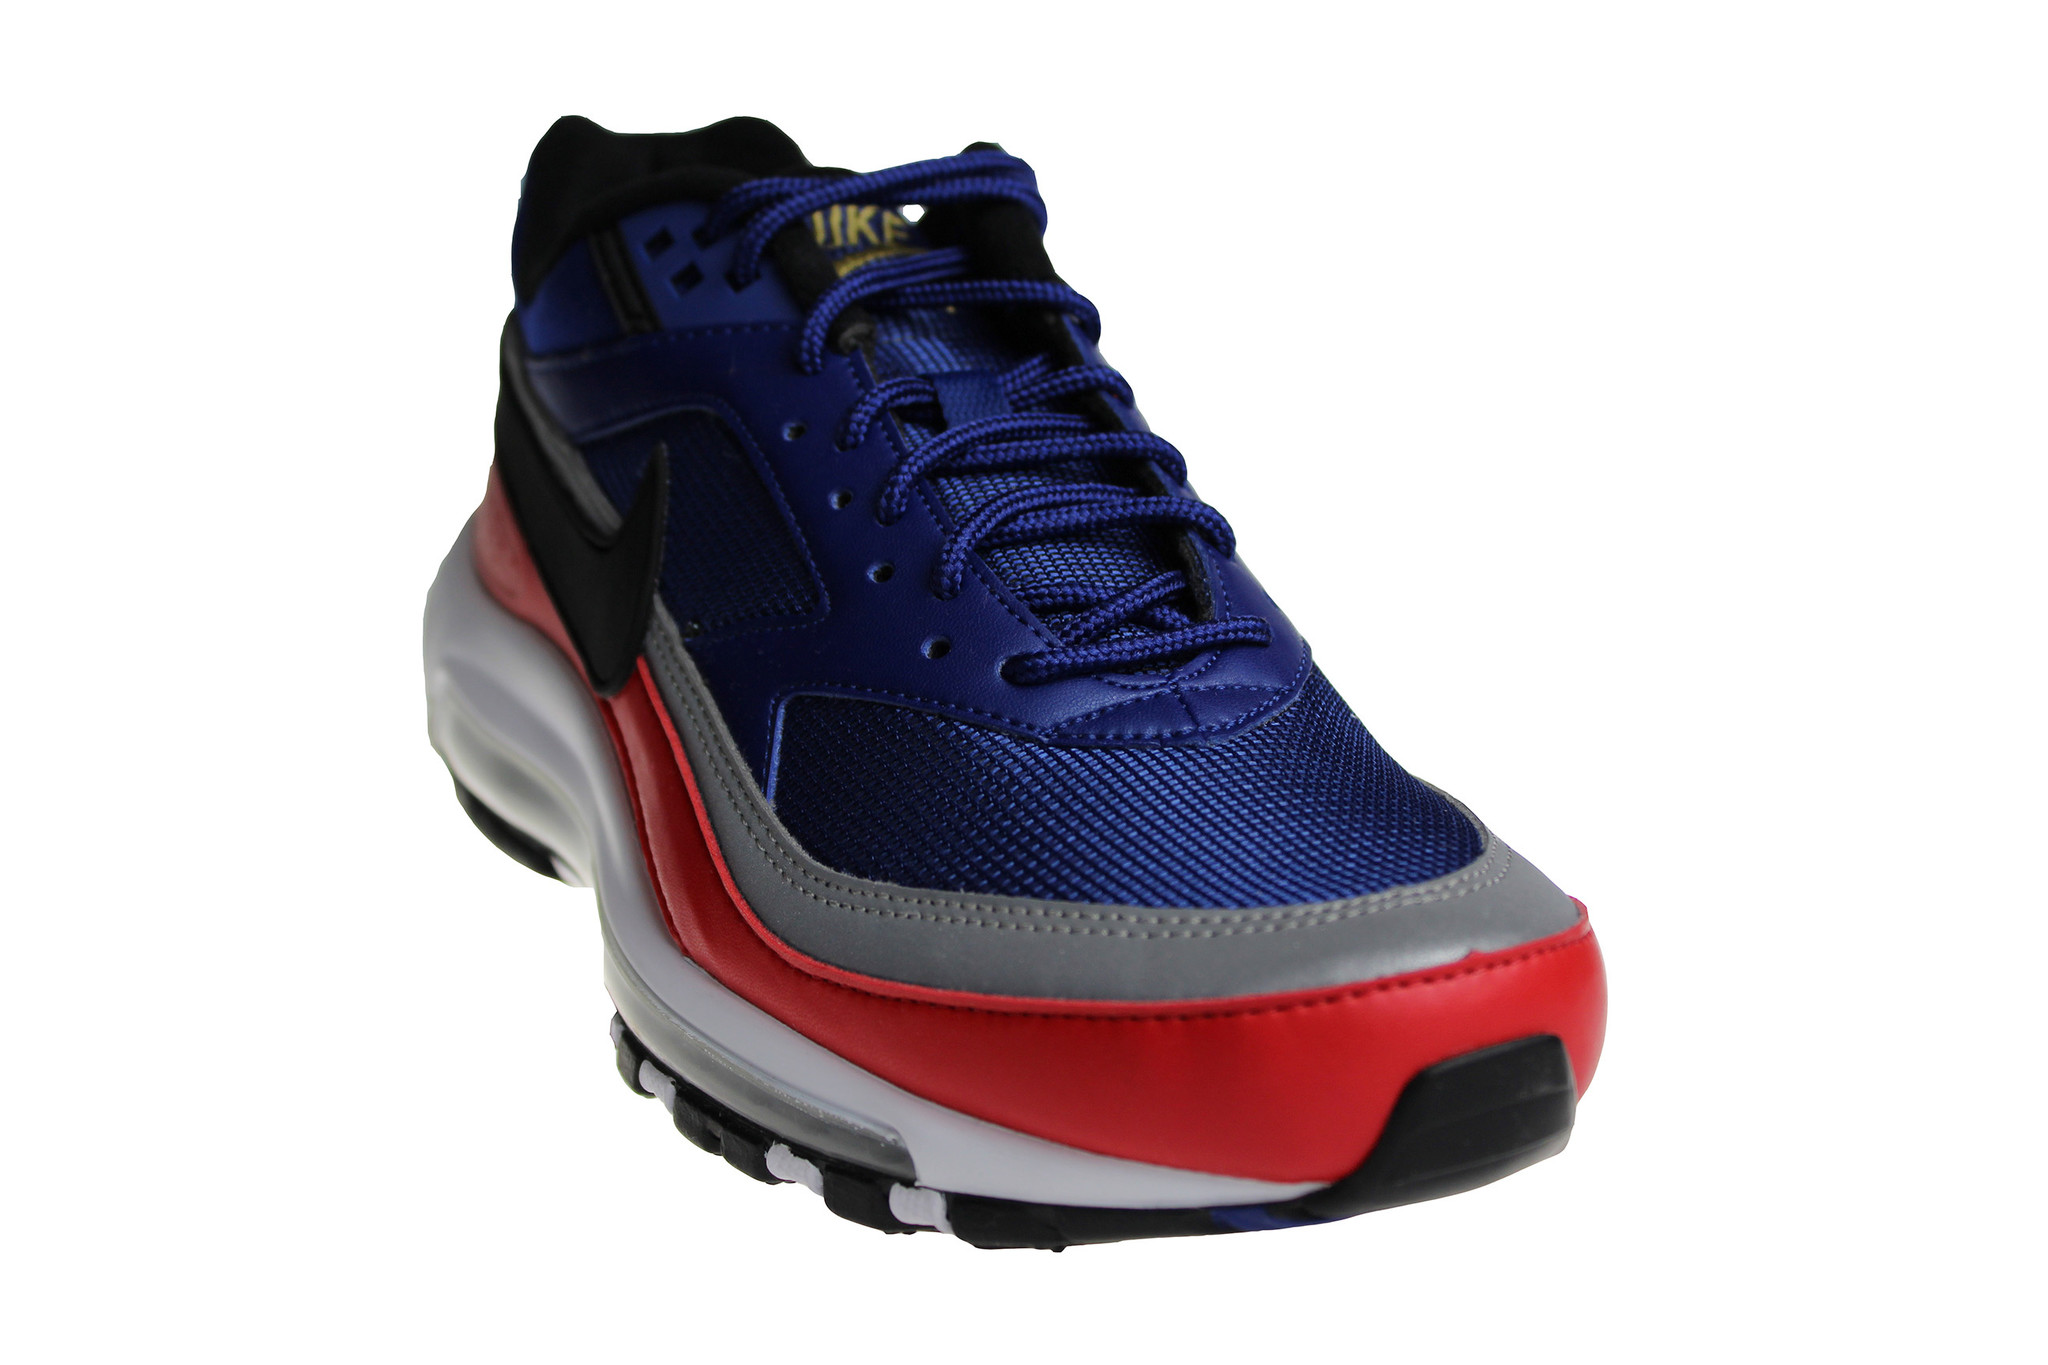 Nike Air Max 97BW (Classic) BlauwRoodZwartGrijsWit AO2406 400 Heren Sportschoenen